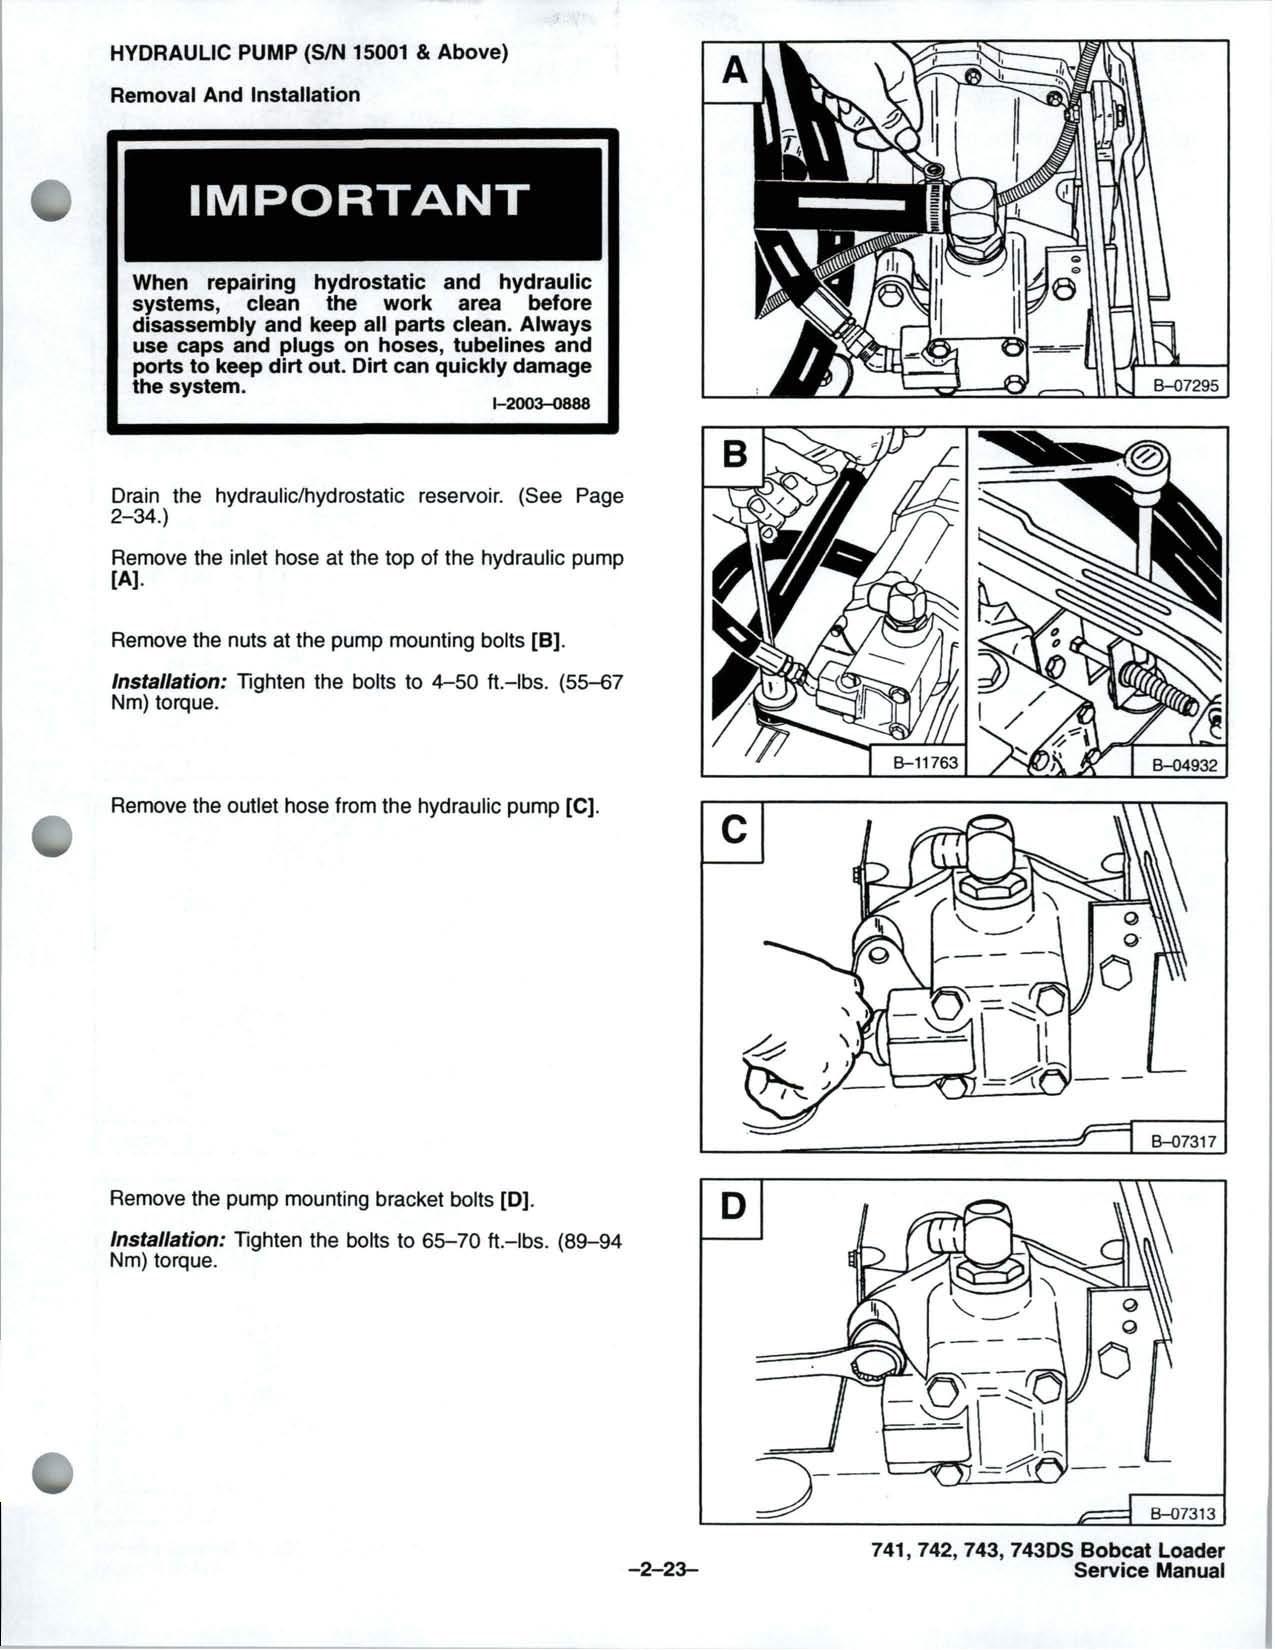 Bobcat 741, 742, 743, 743DS Factory Service and Repair Manual